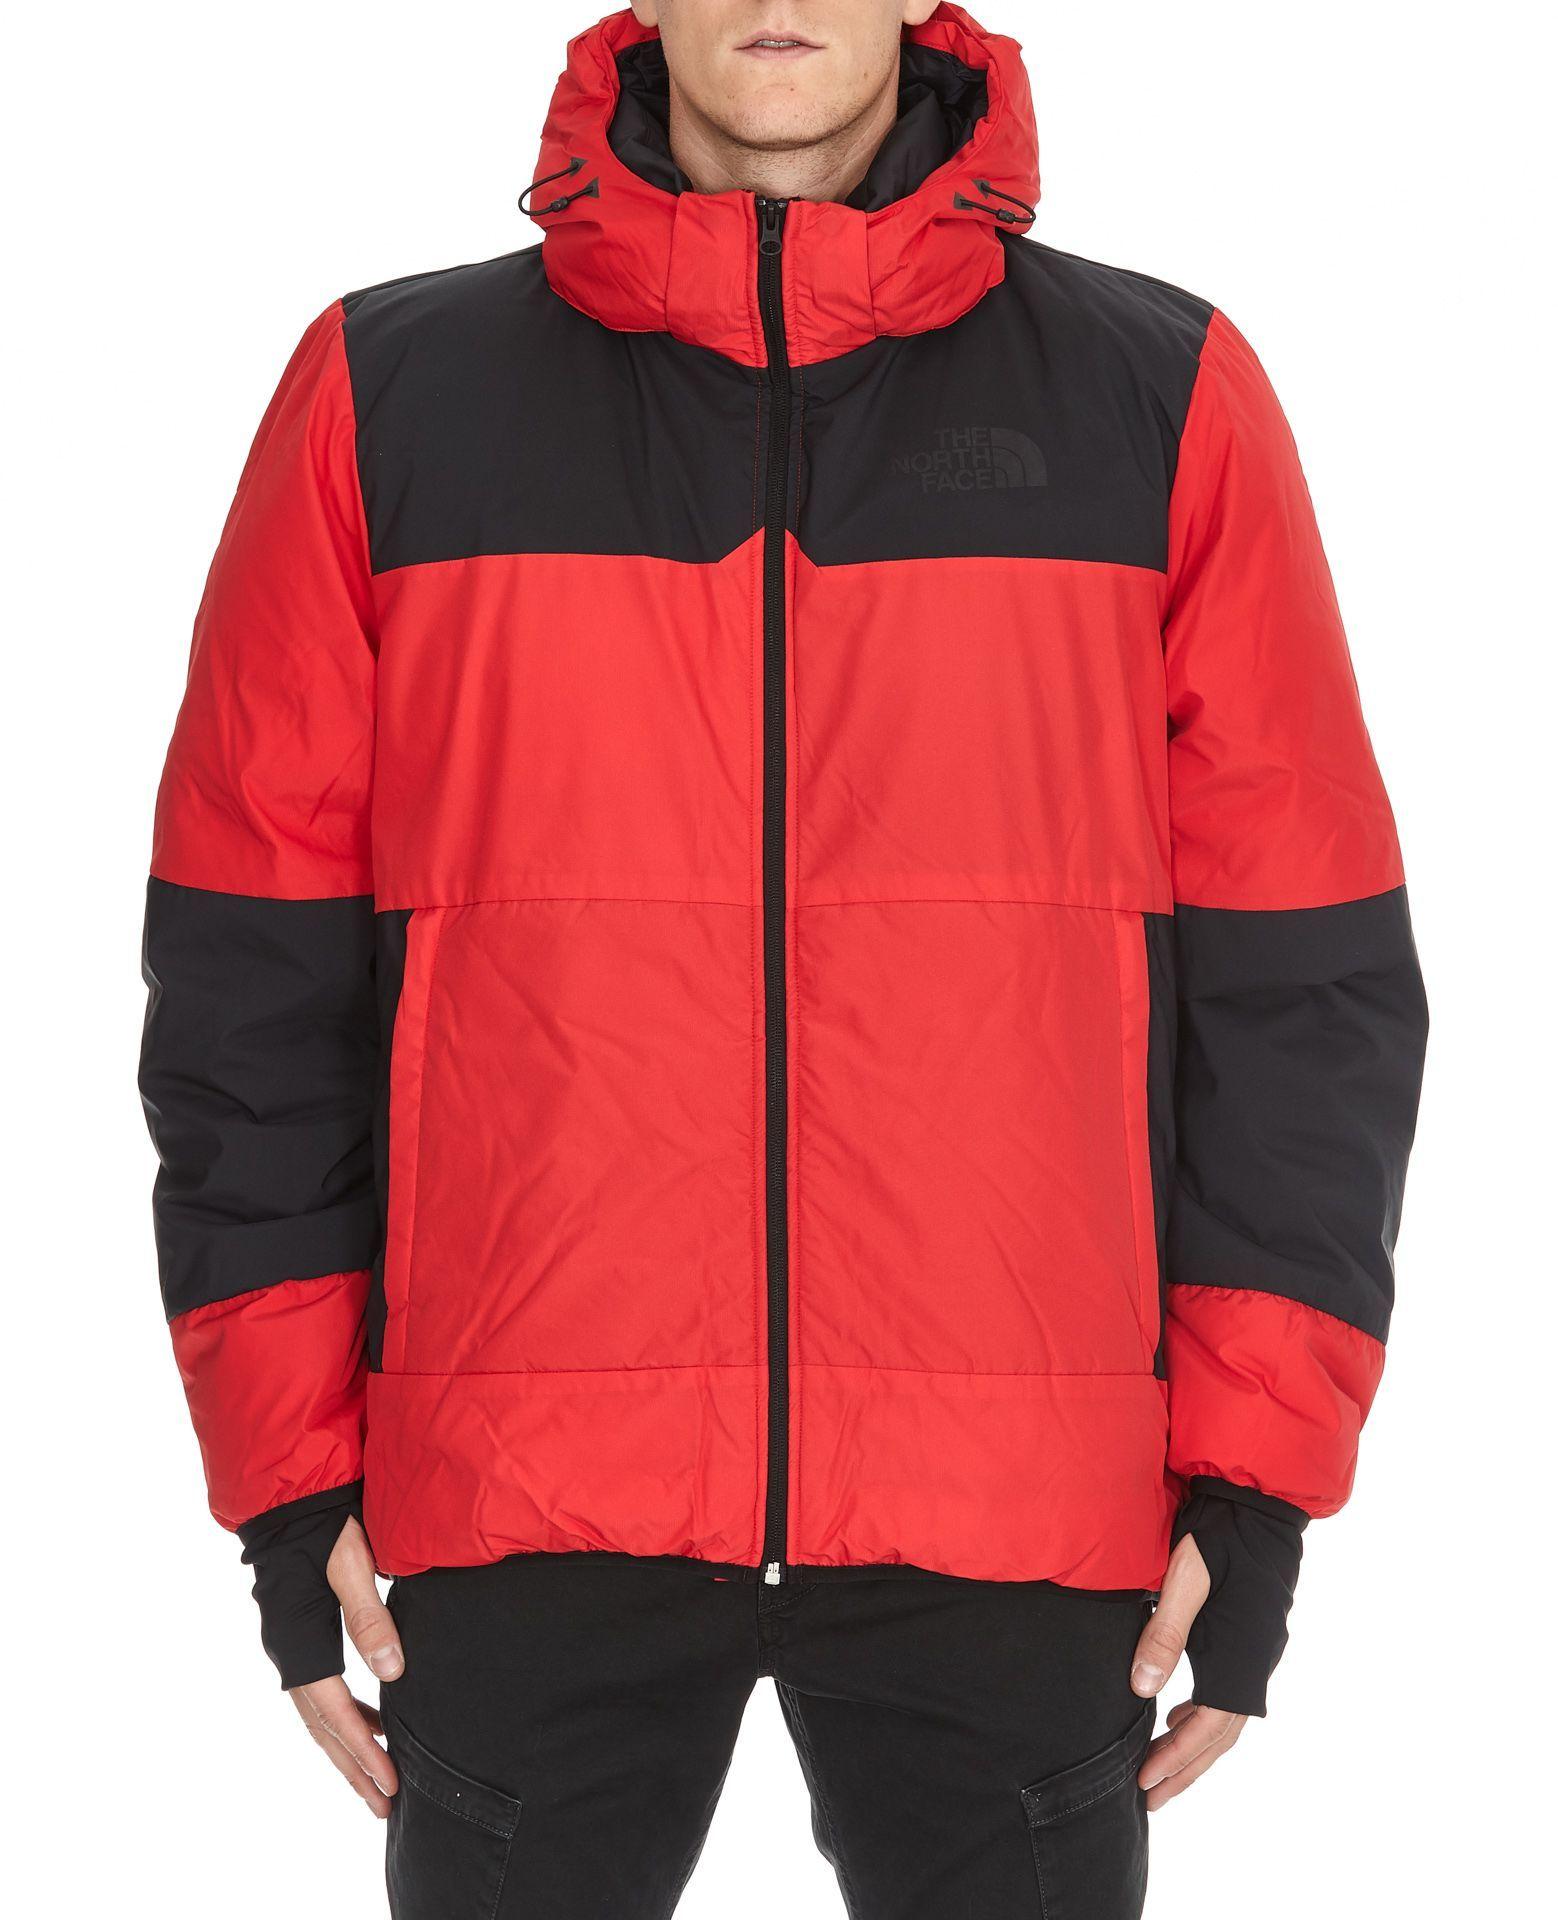 The North Face Nuptse Heavy Jacket In Black Red Modesens Heavy Jacket North Face Nuptse Jackets [ 1920 x 1558 Pixel ]